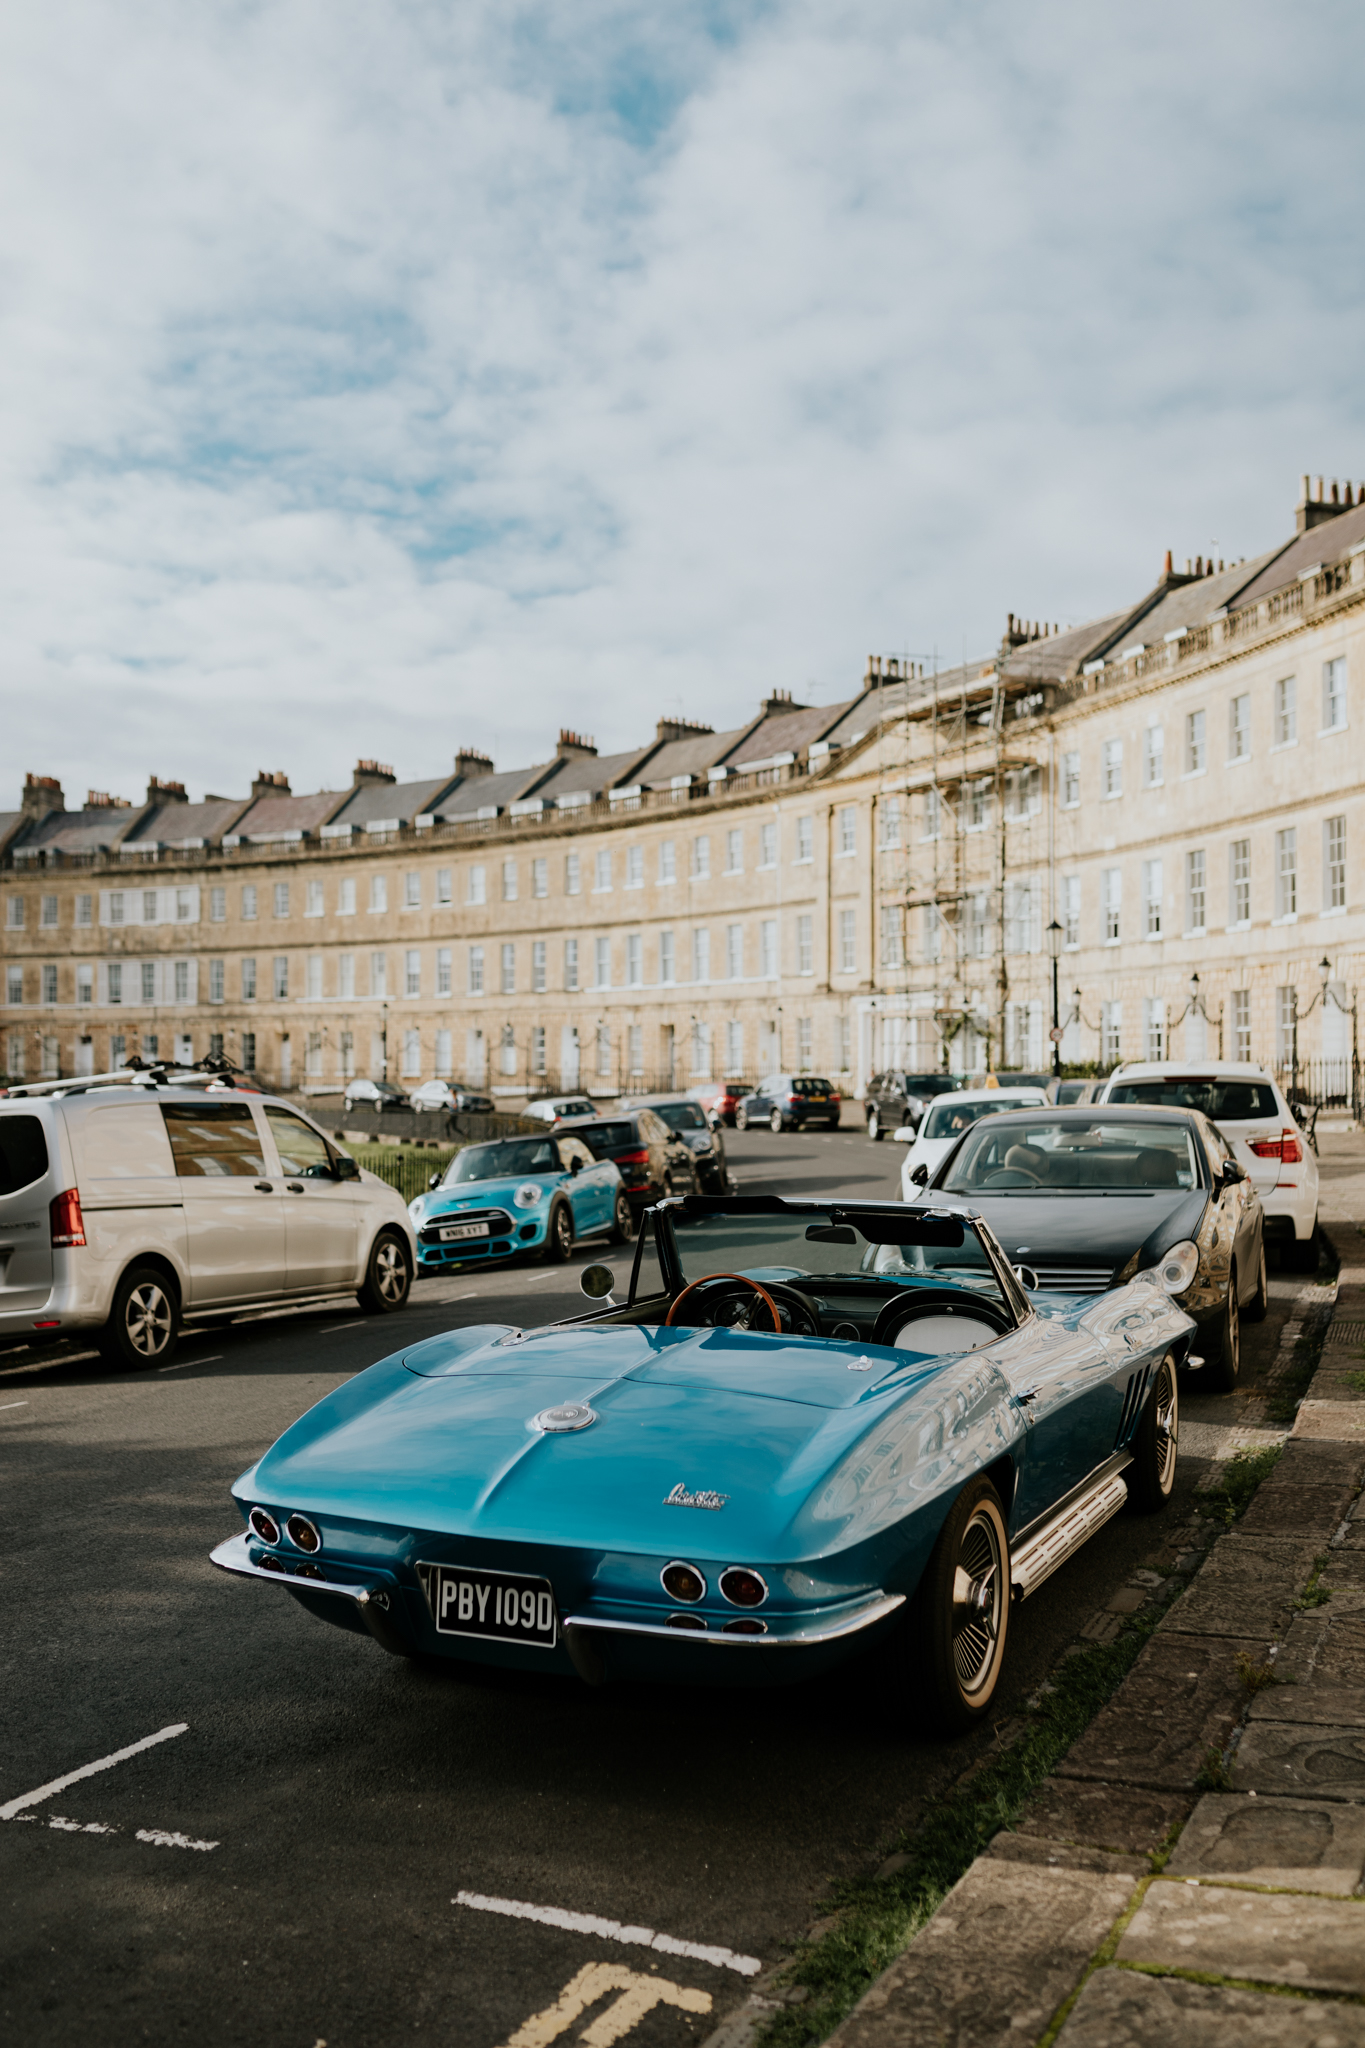 Natalie Skoric Photography - England Travel v2-4.jpg